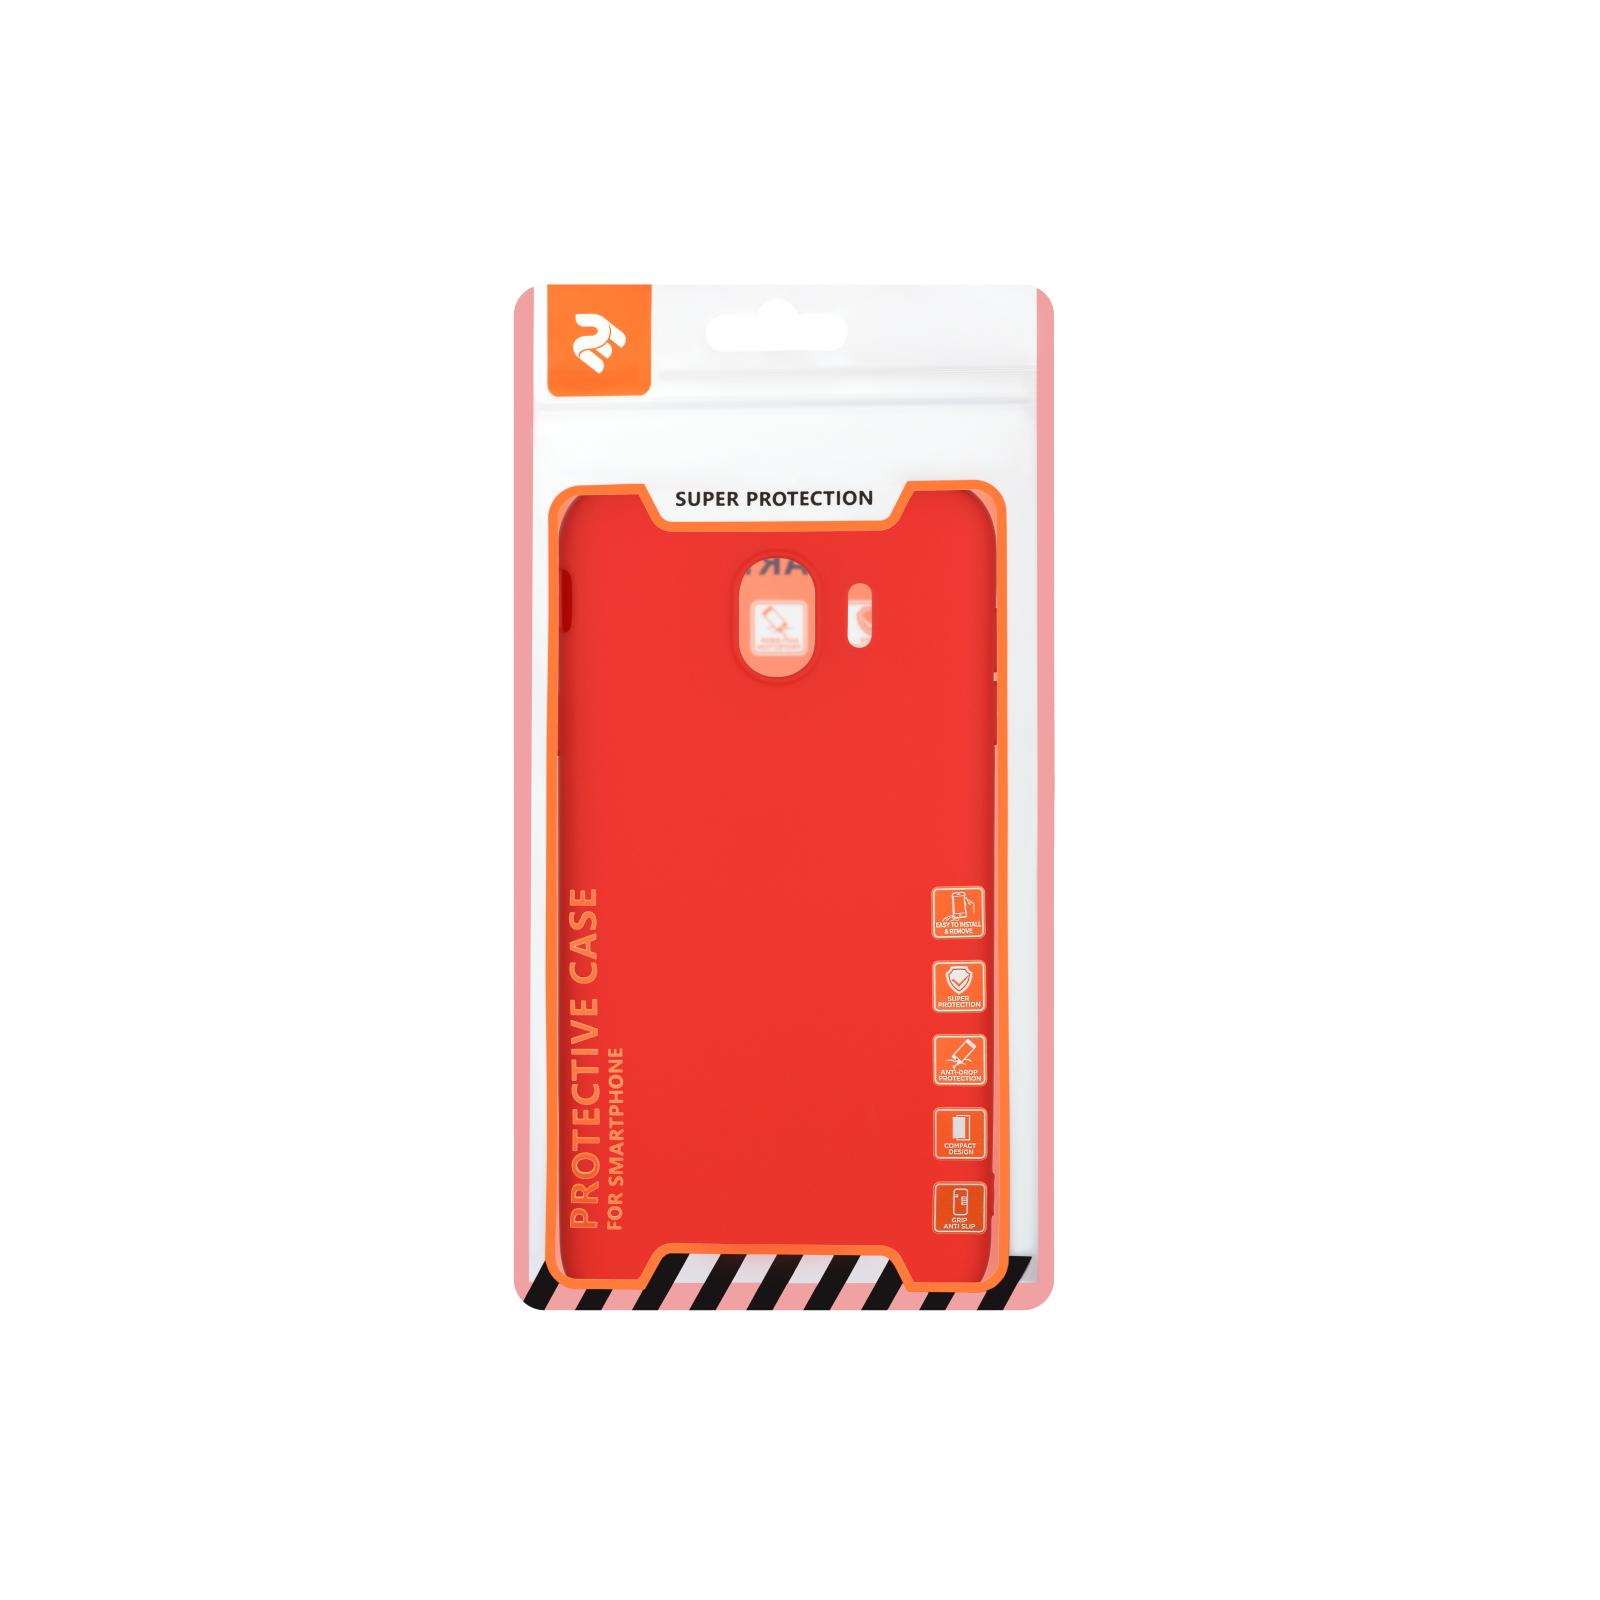 Чохол до моб. телефона 2E Samsung Galaxy J4 2018 (J400) , Soft touch, Red (2E-G-J4-18-NKST-RD) зображення 3